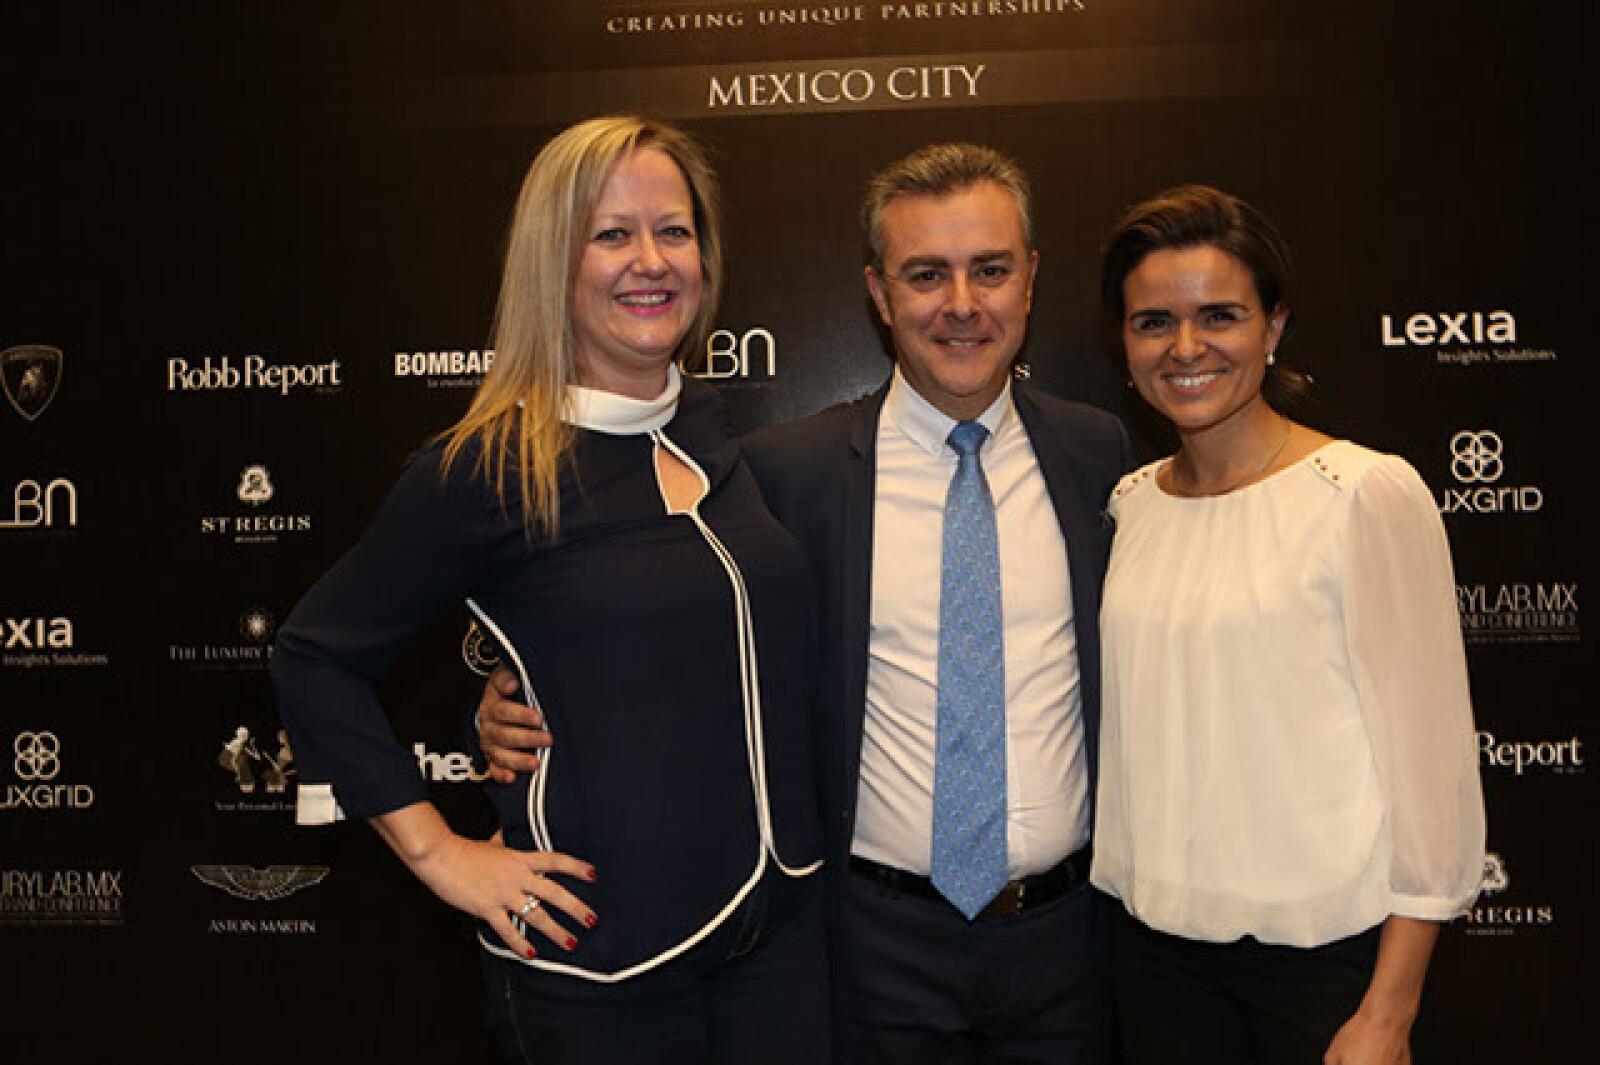 Yolanda Ruiz,Jon Scooter,Ingrid de Barrios